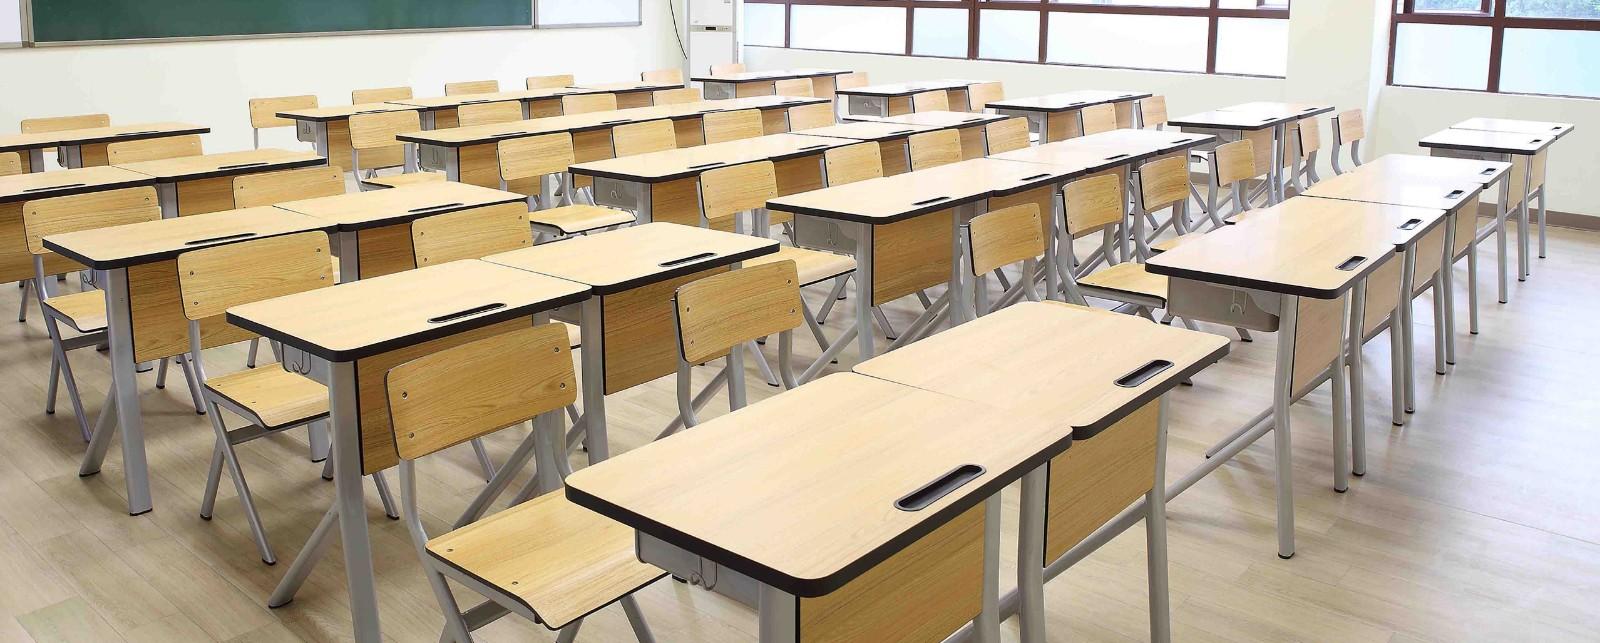 HONGJI tc004 school table and chair set manufacturer fpr classroom-12